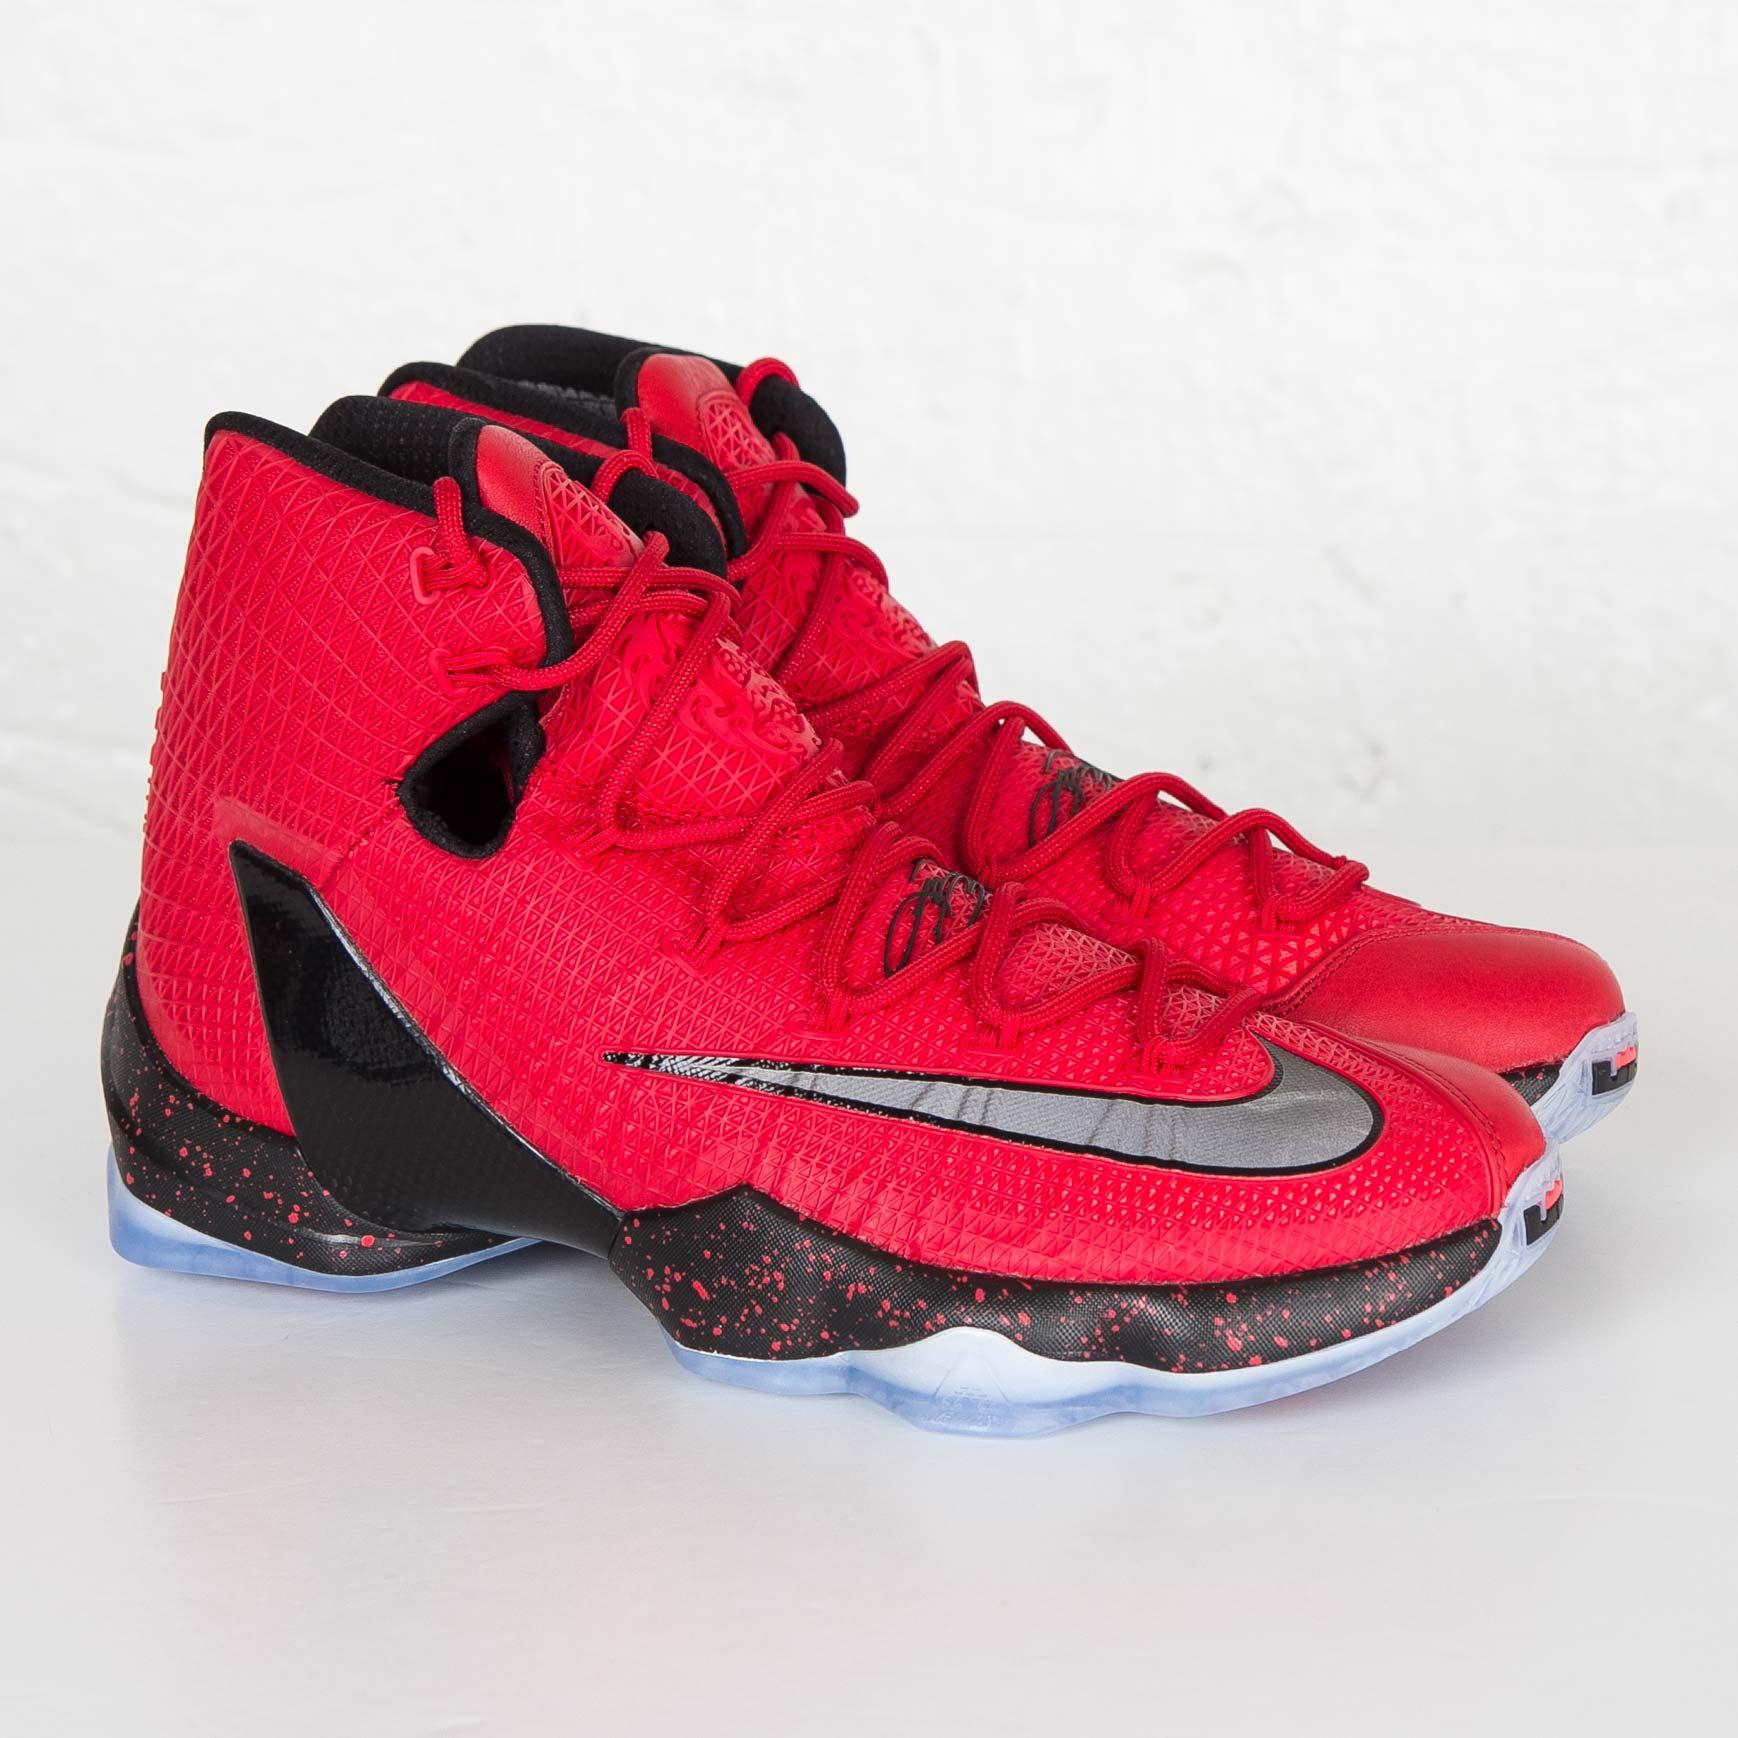 Nike Lebron XIII Elite - 831923-606 - Sneakersnstuff  b63564916